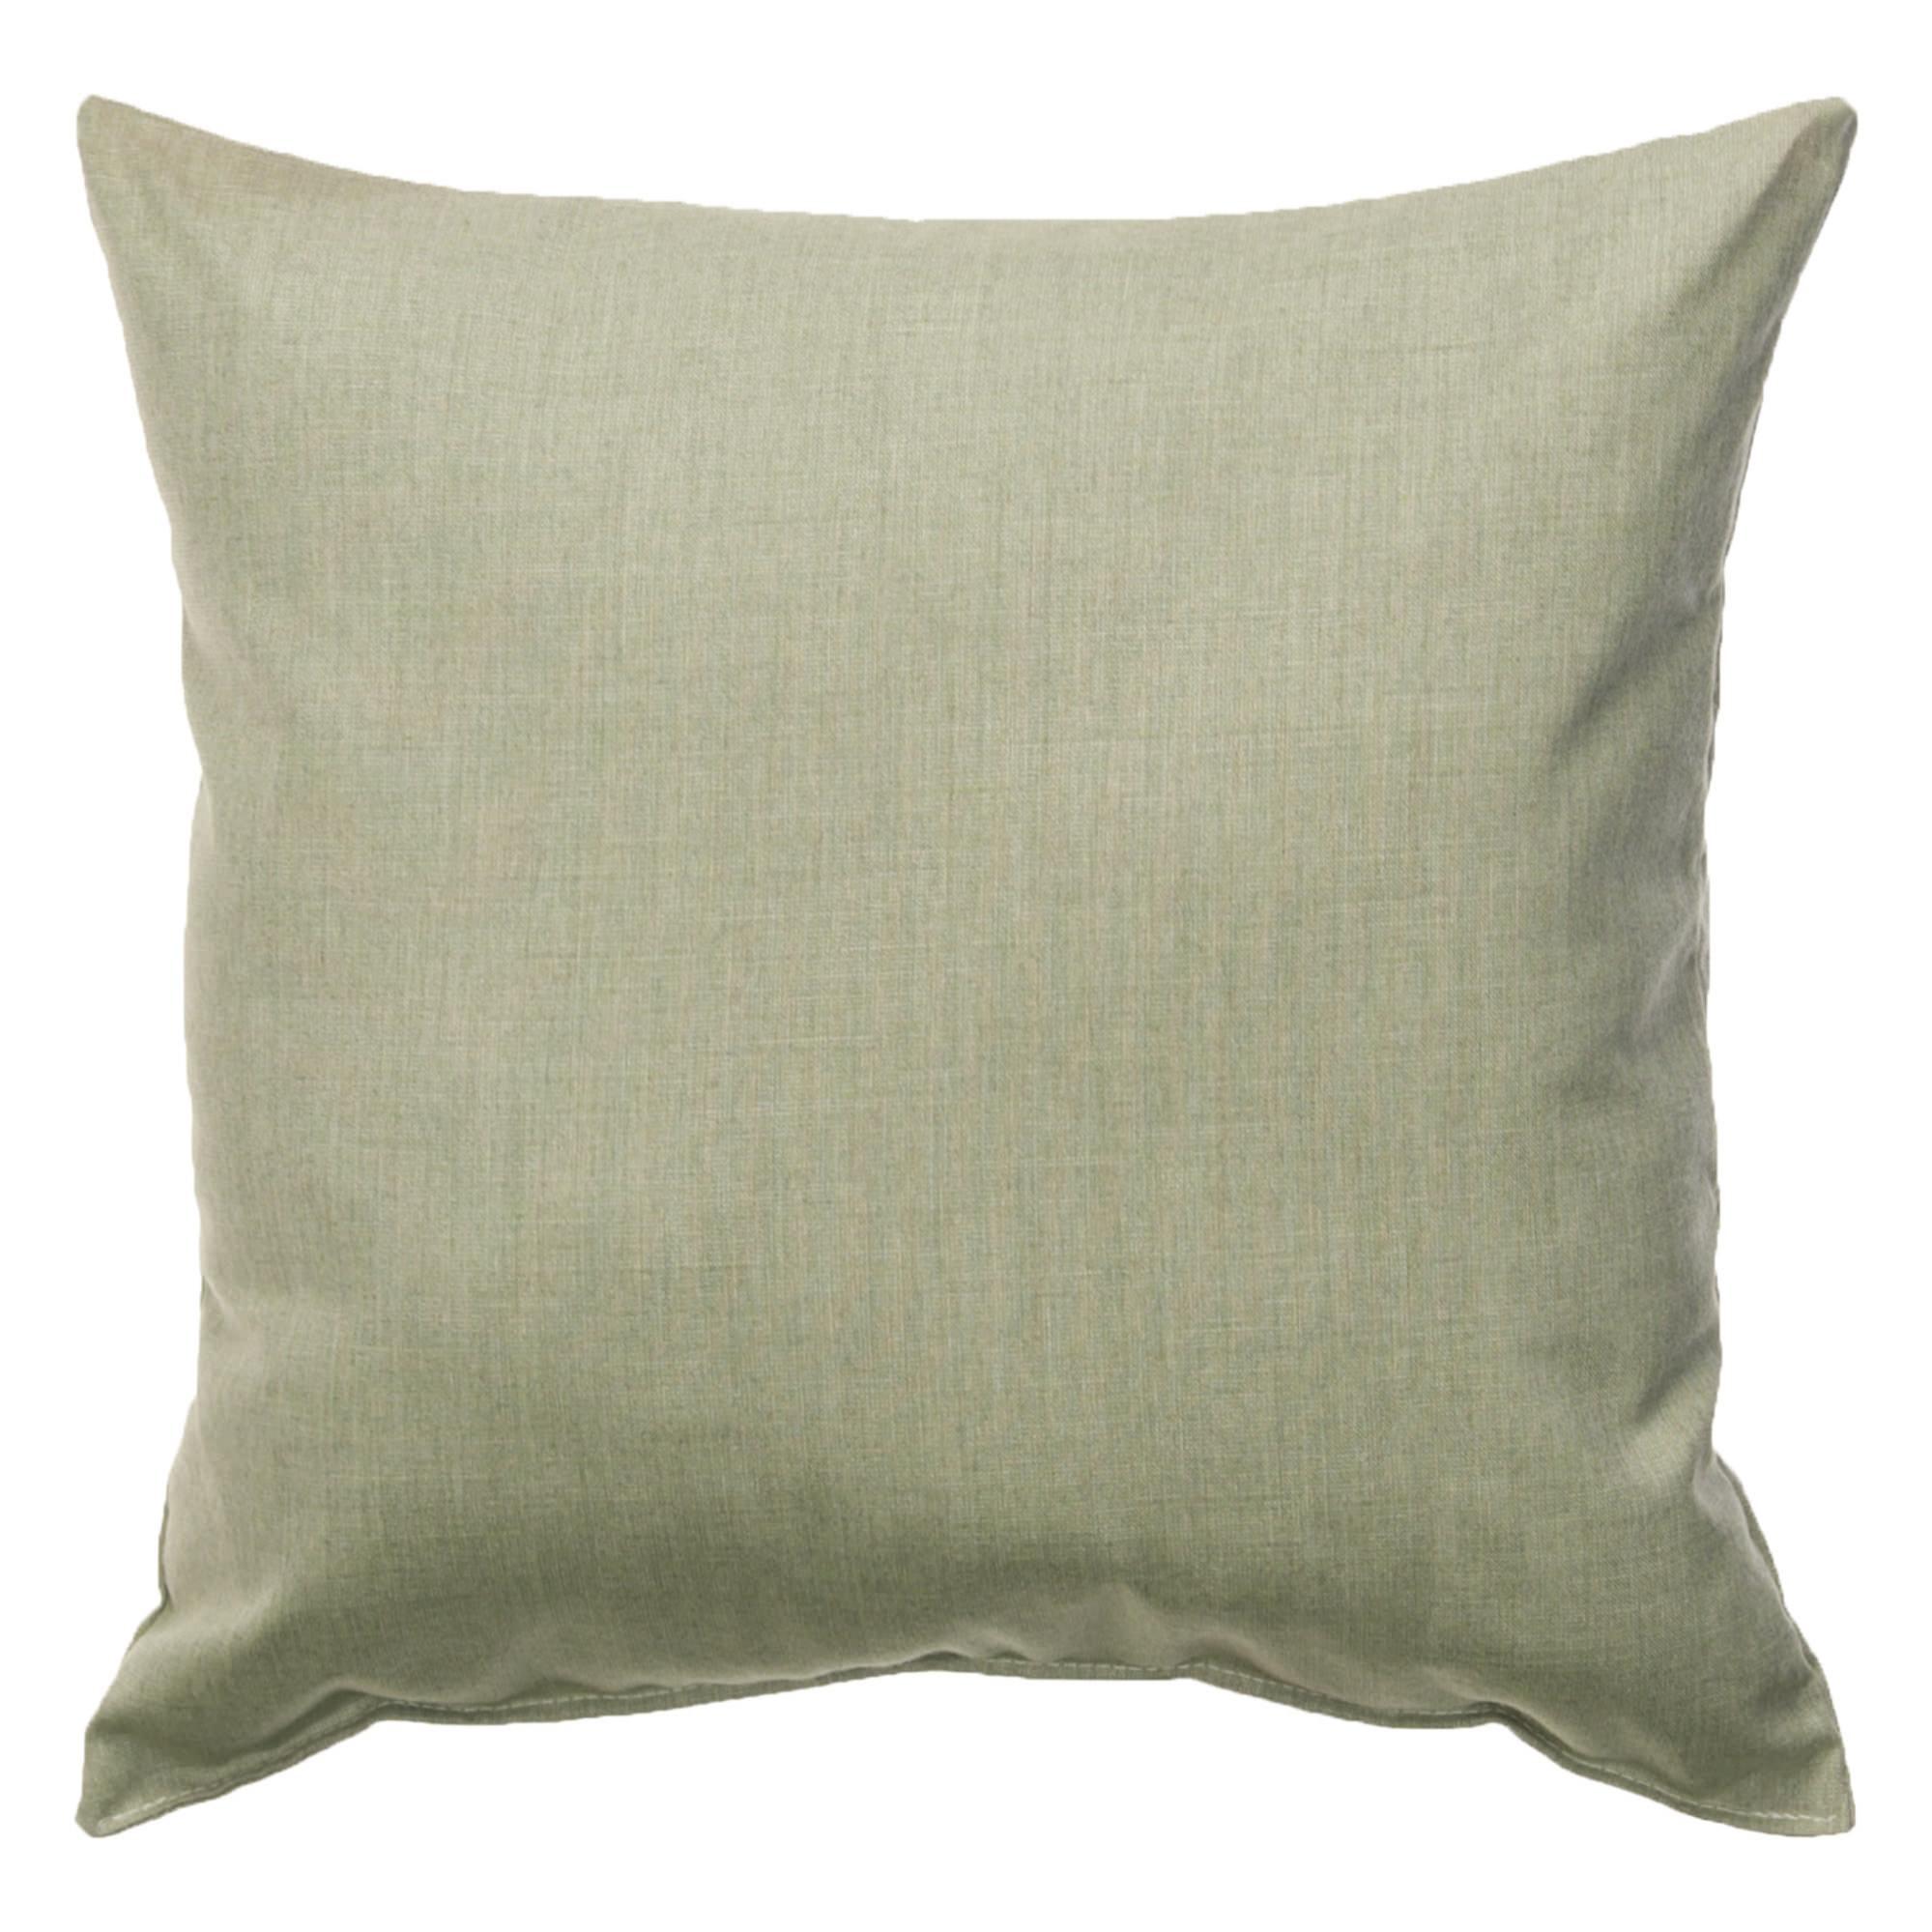 Cast Oasis Sunbrella Outdoor Throw Pillows On Sale